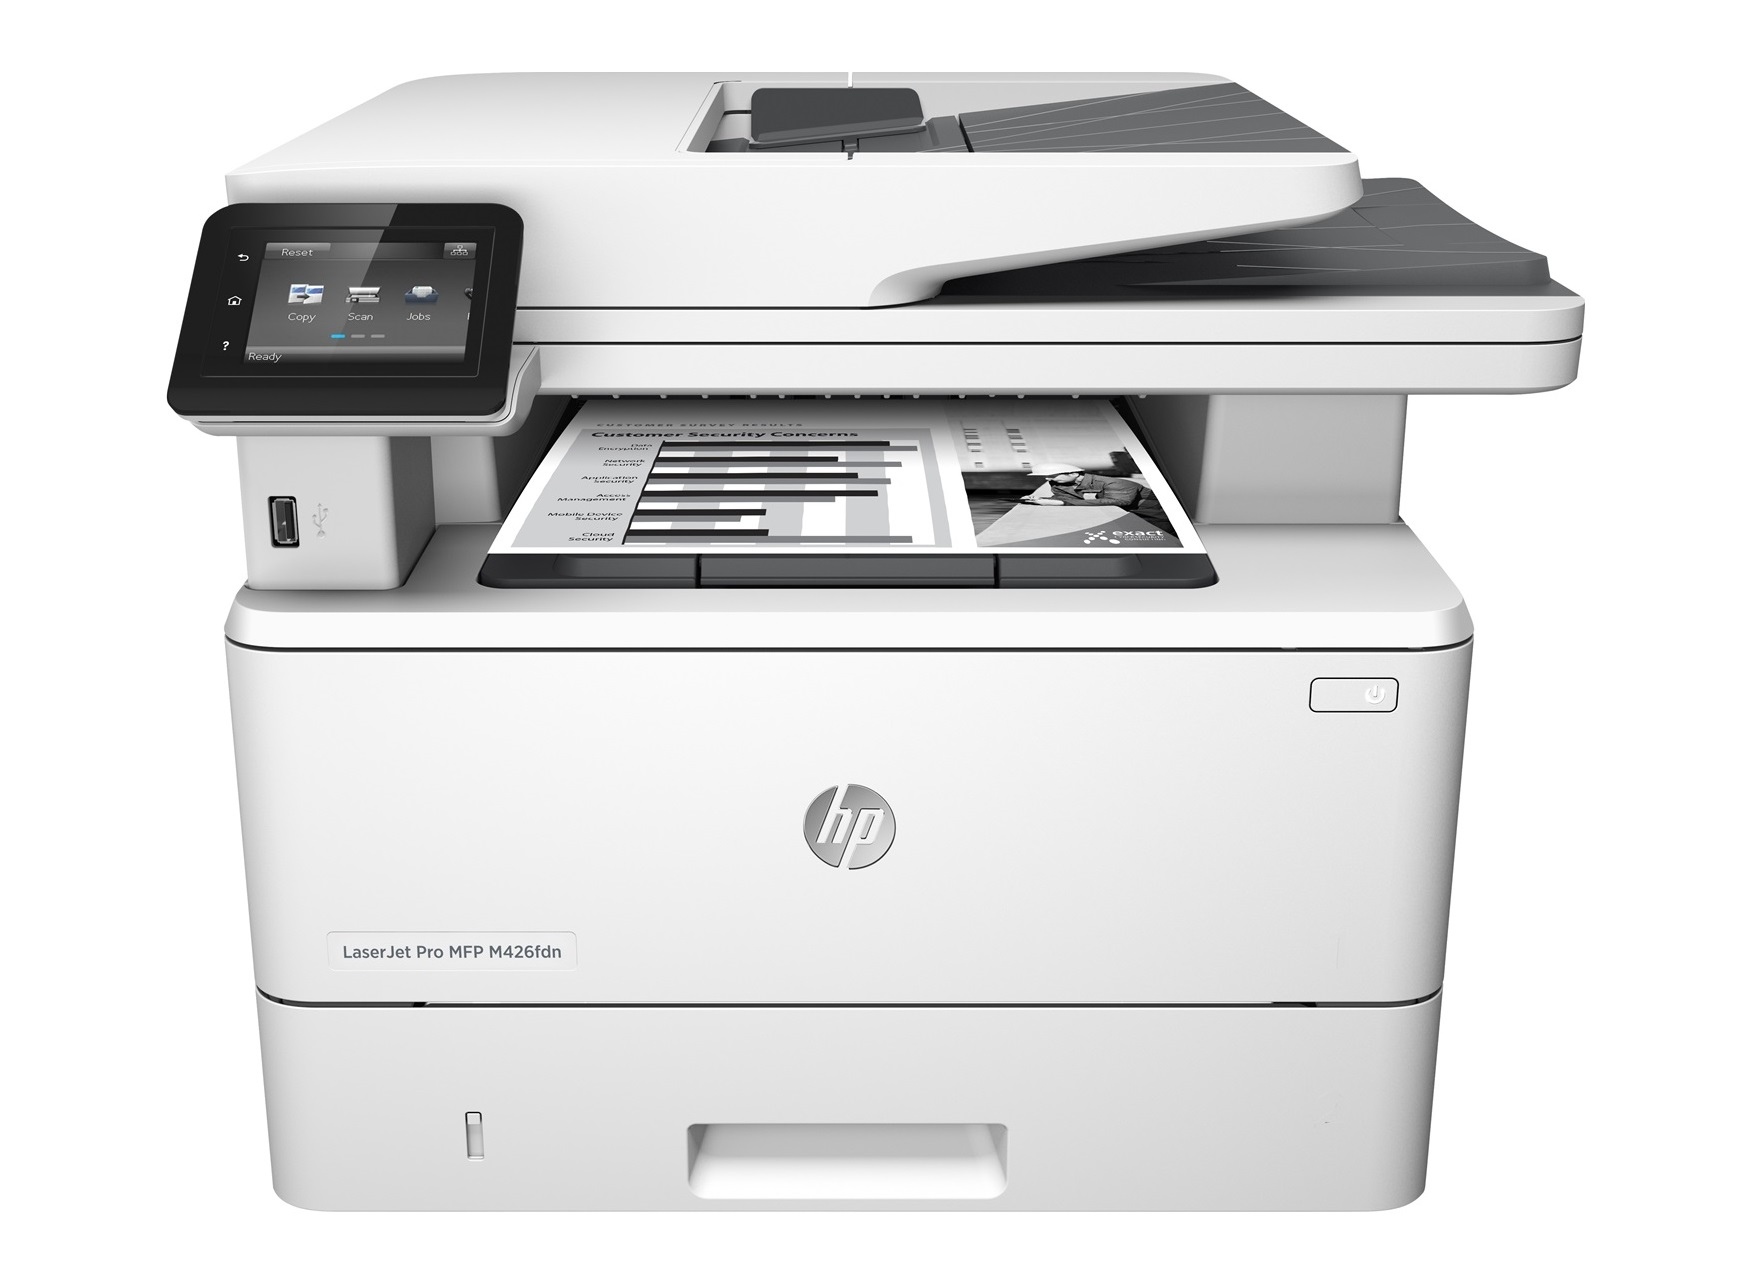 Máy in đa năng HP LaserJet Pro MFP M426fdw